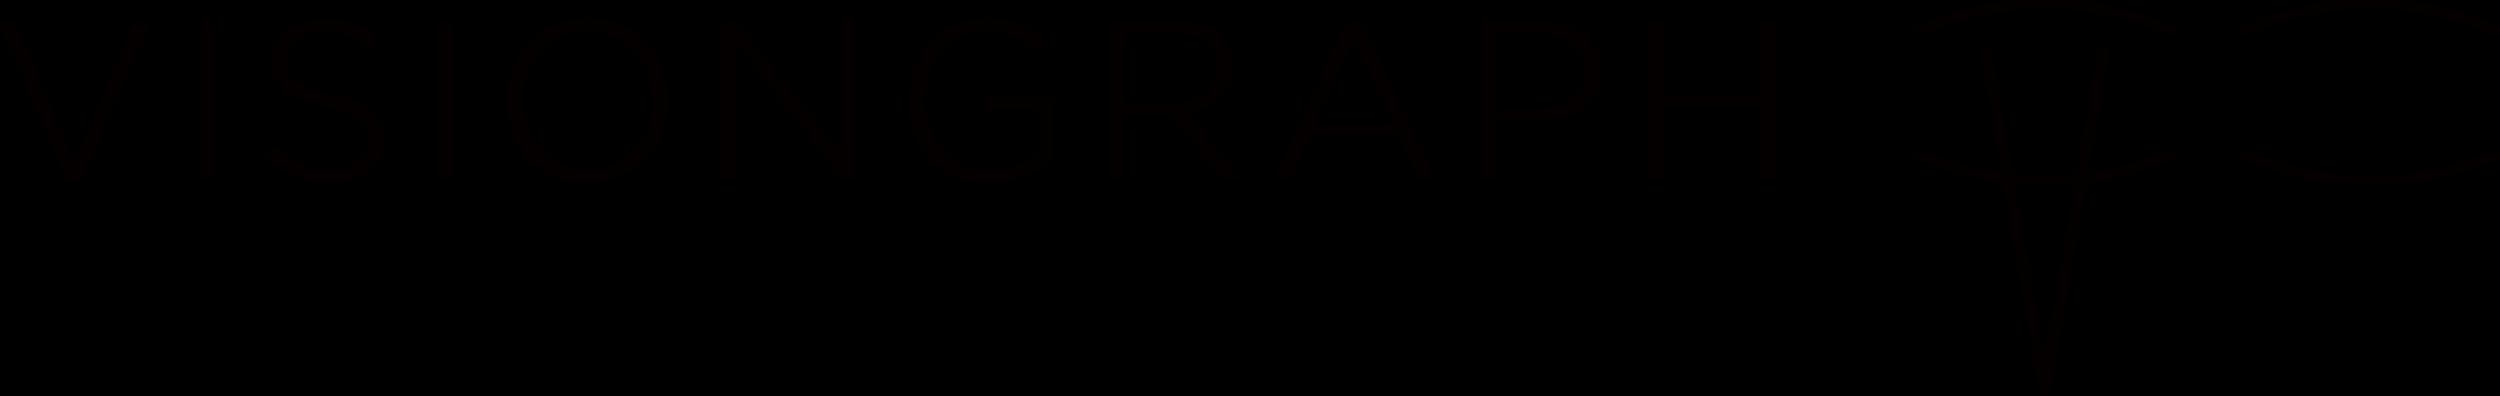 vishiongraph_logo